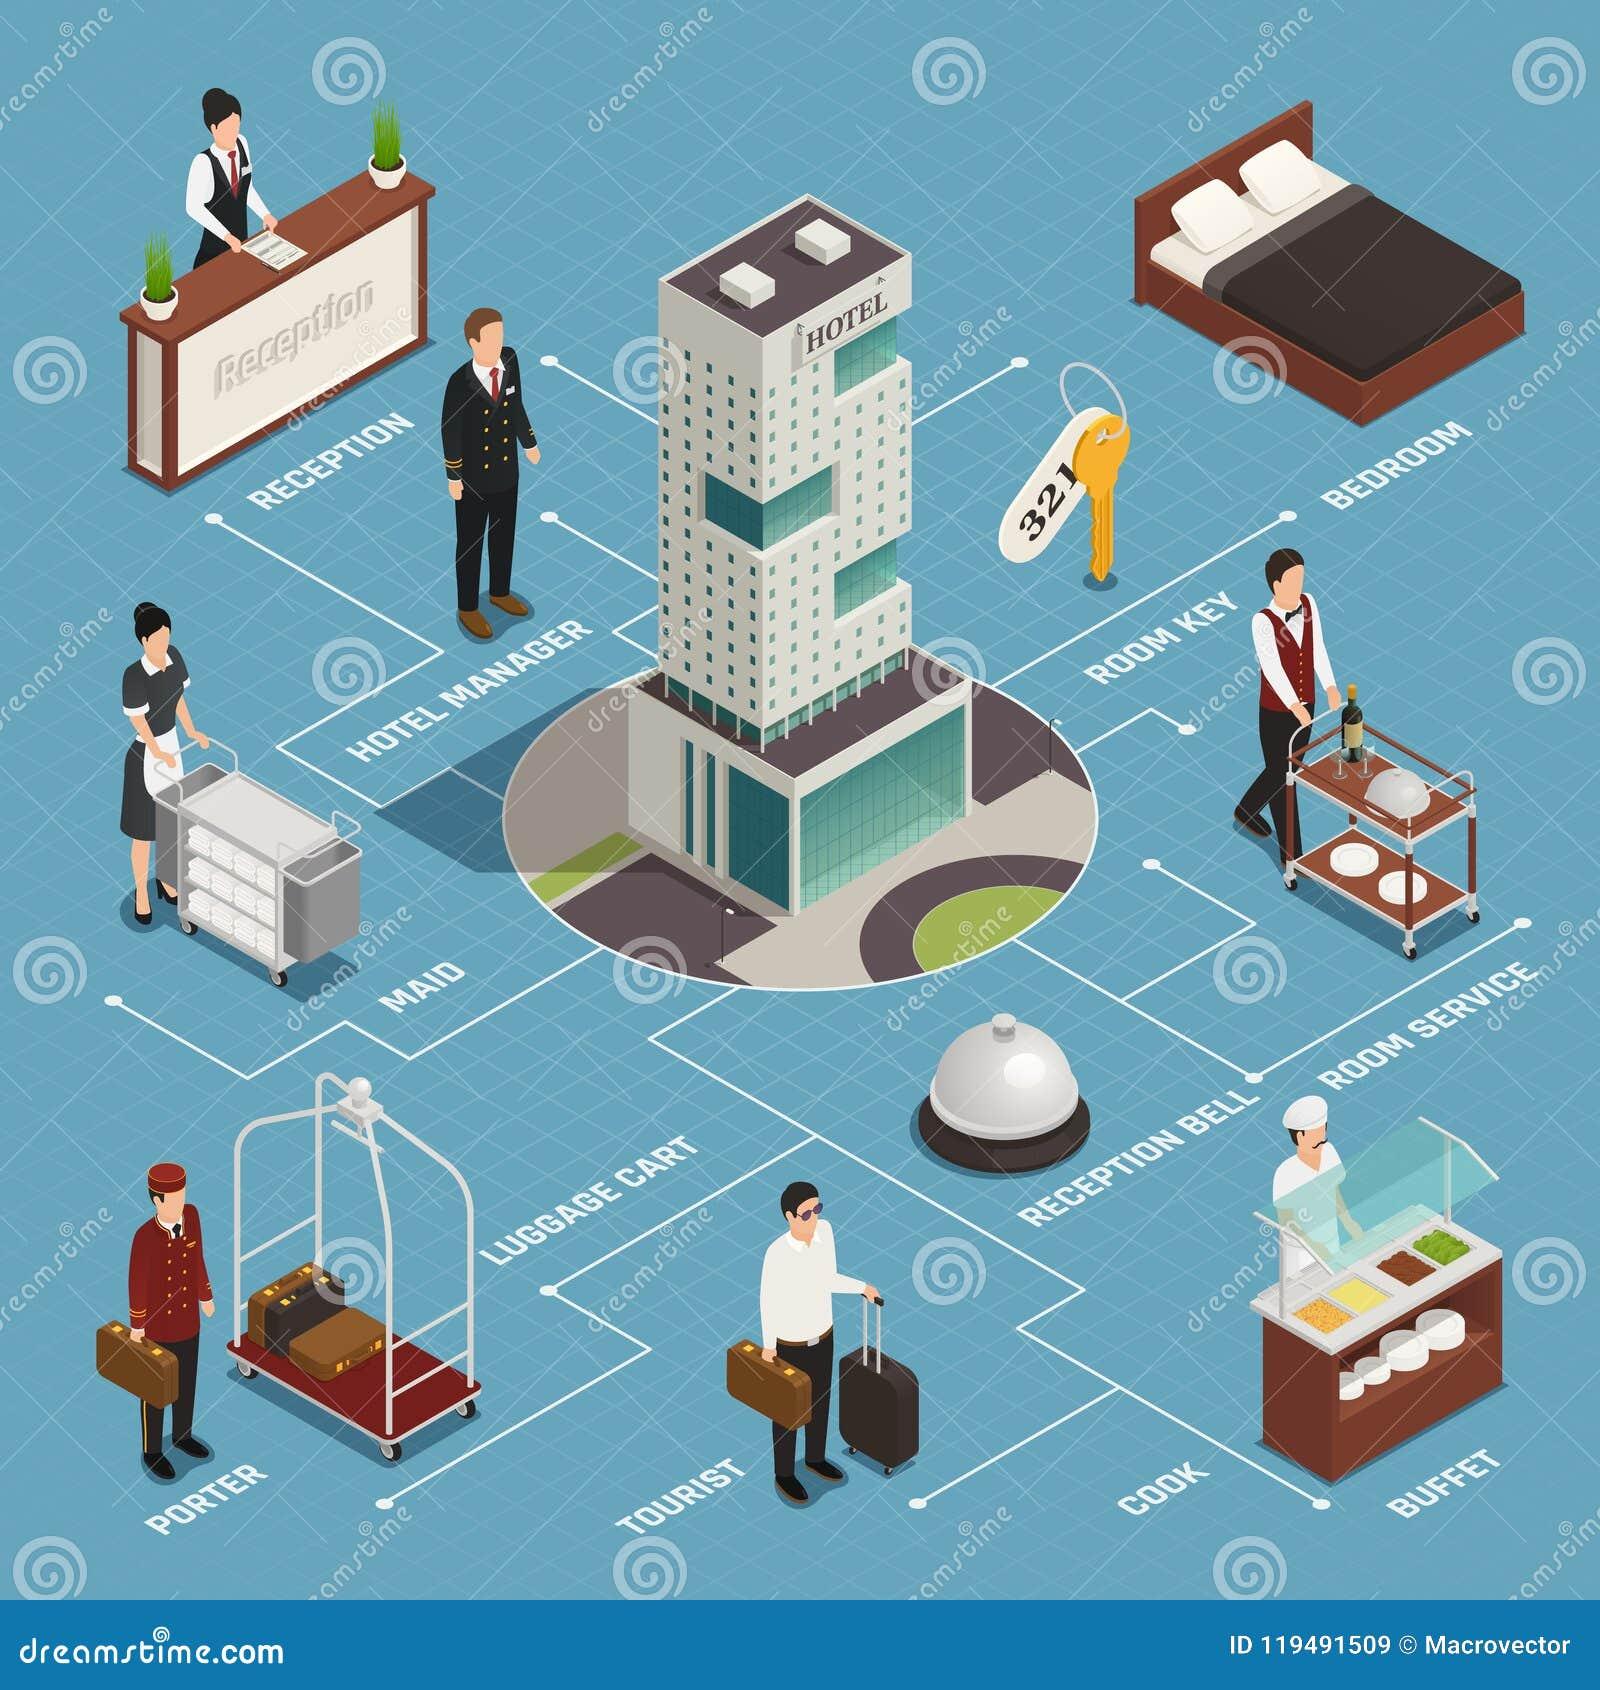 Hotel Service Isometric Flowchart